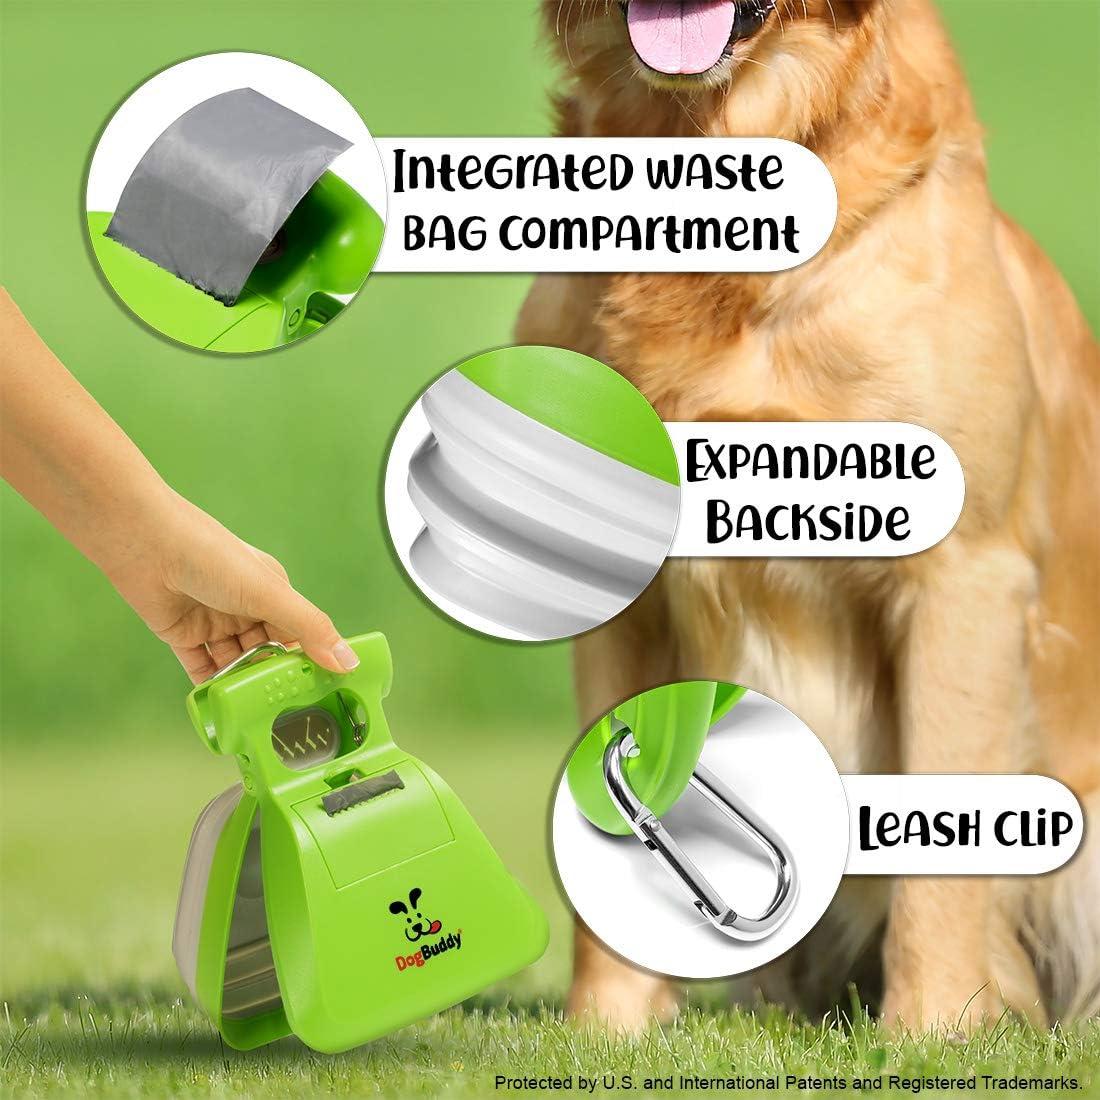 Medium Dog Poop Scooper with Waste Bag Dispenser Portable Poop Scoop Small DogBuddy New Pooper Scooper Kiwi Medium or Large Dog Pooper Scooper